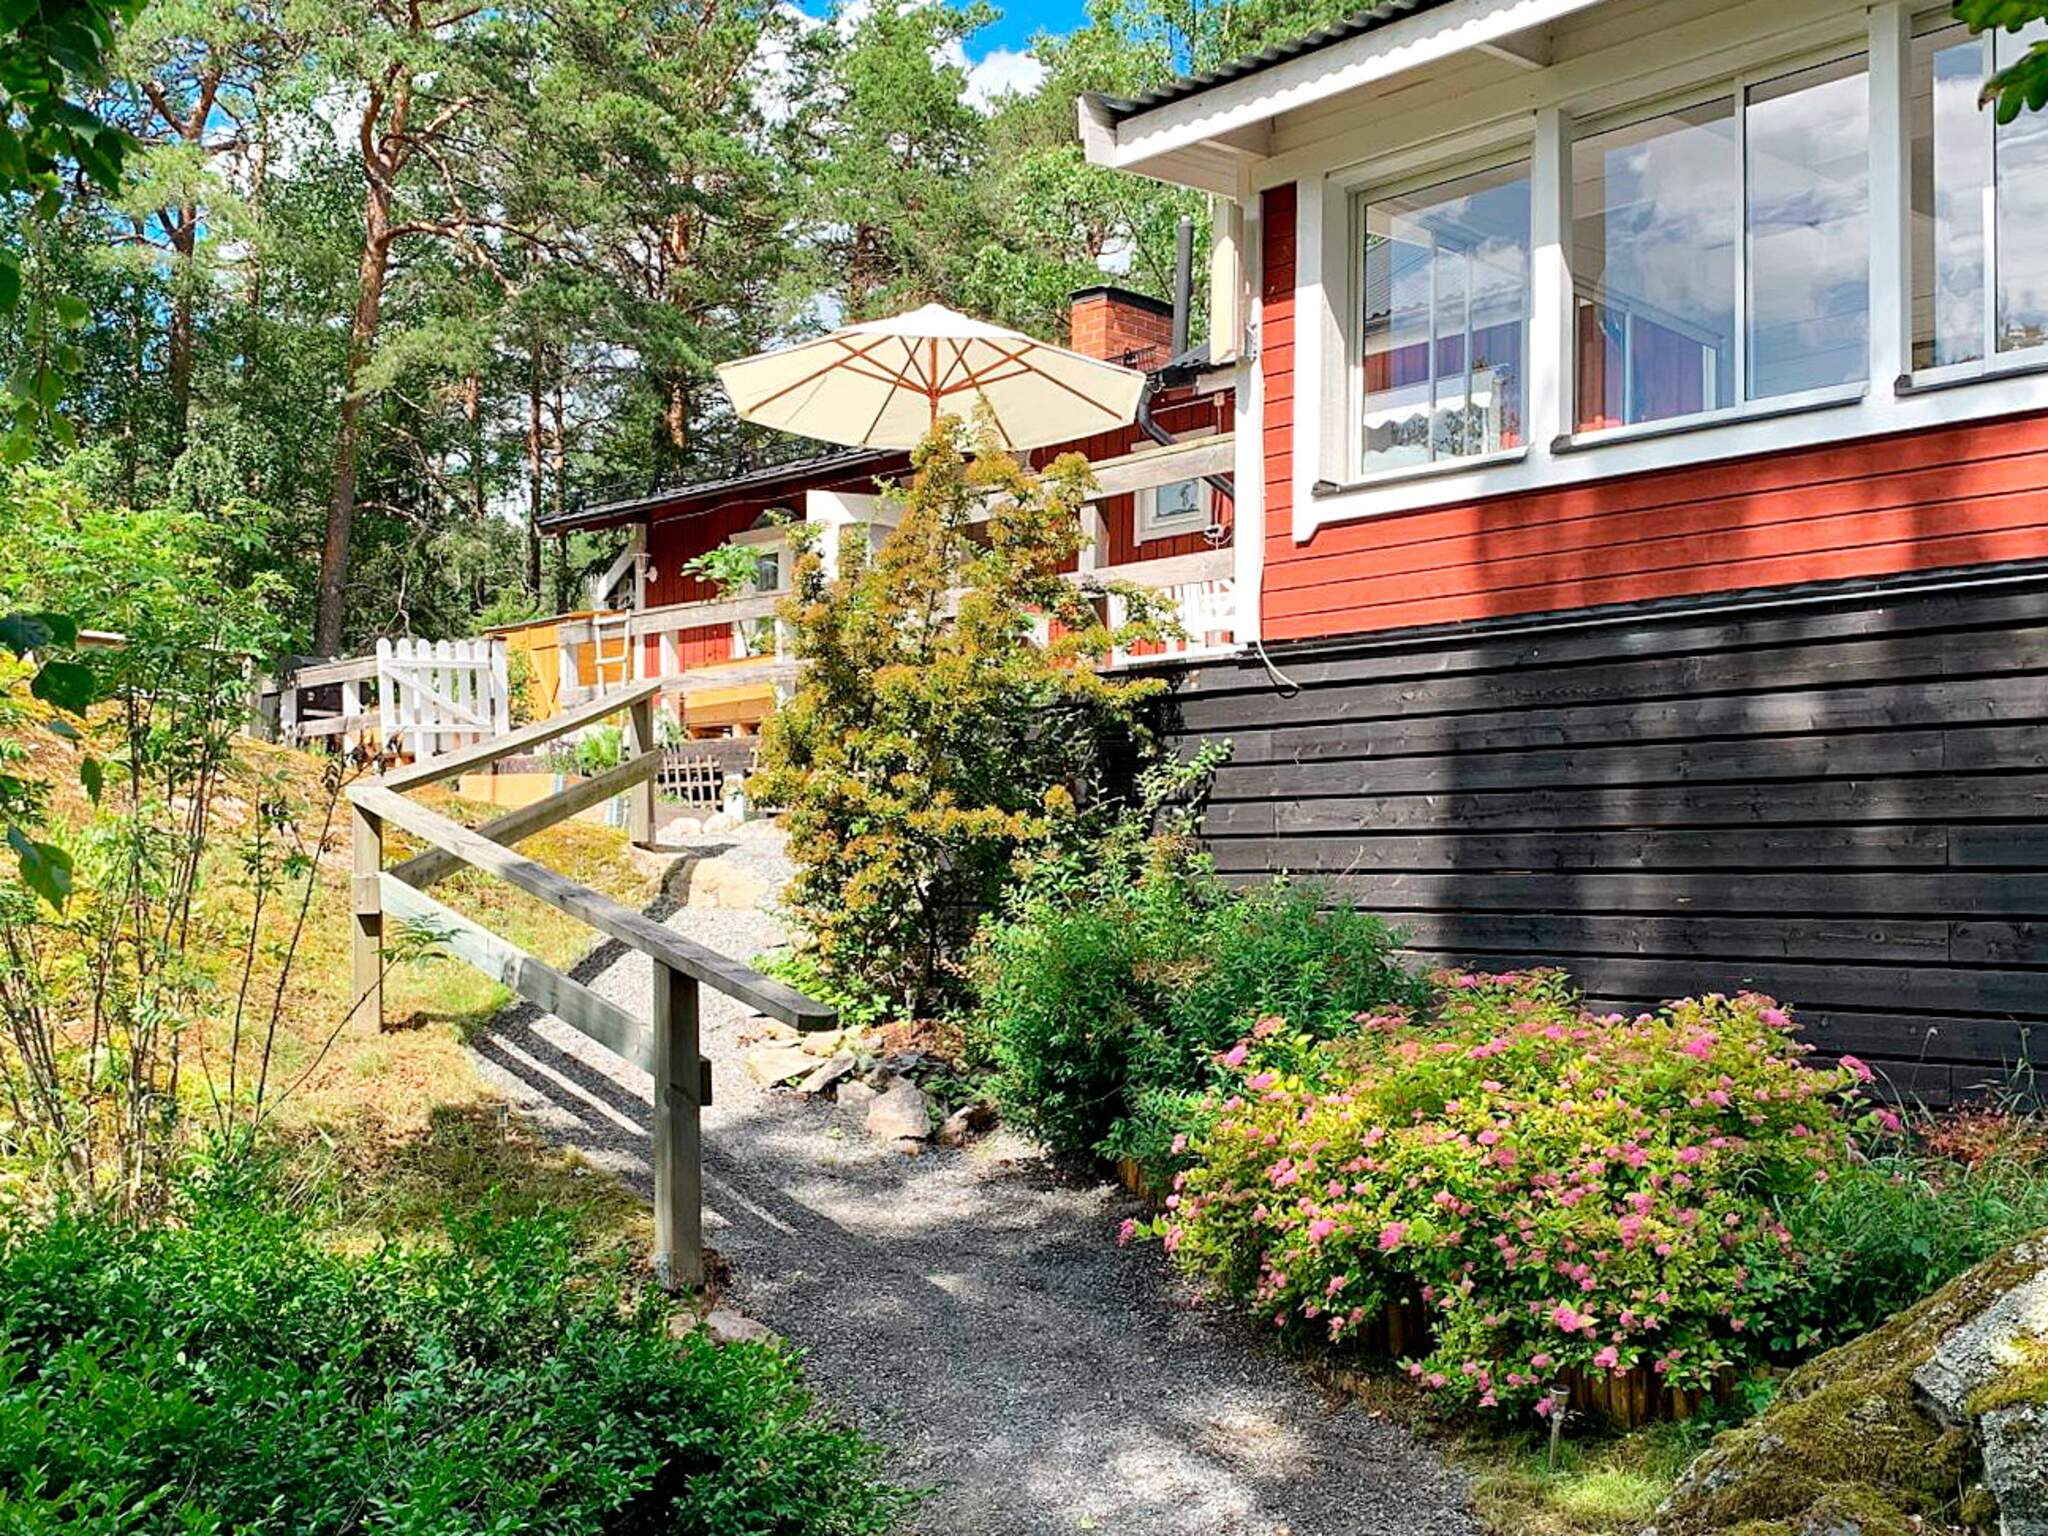 Ferienhaus Värmdö (2633225), Värmdö, Region Stockholm, Mittelschweden, Schweden, Bild 16